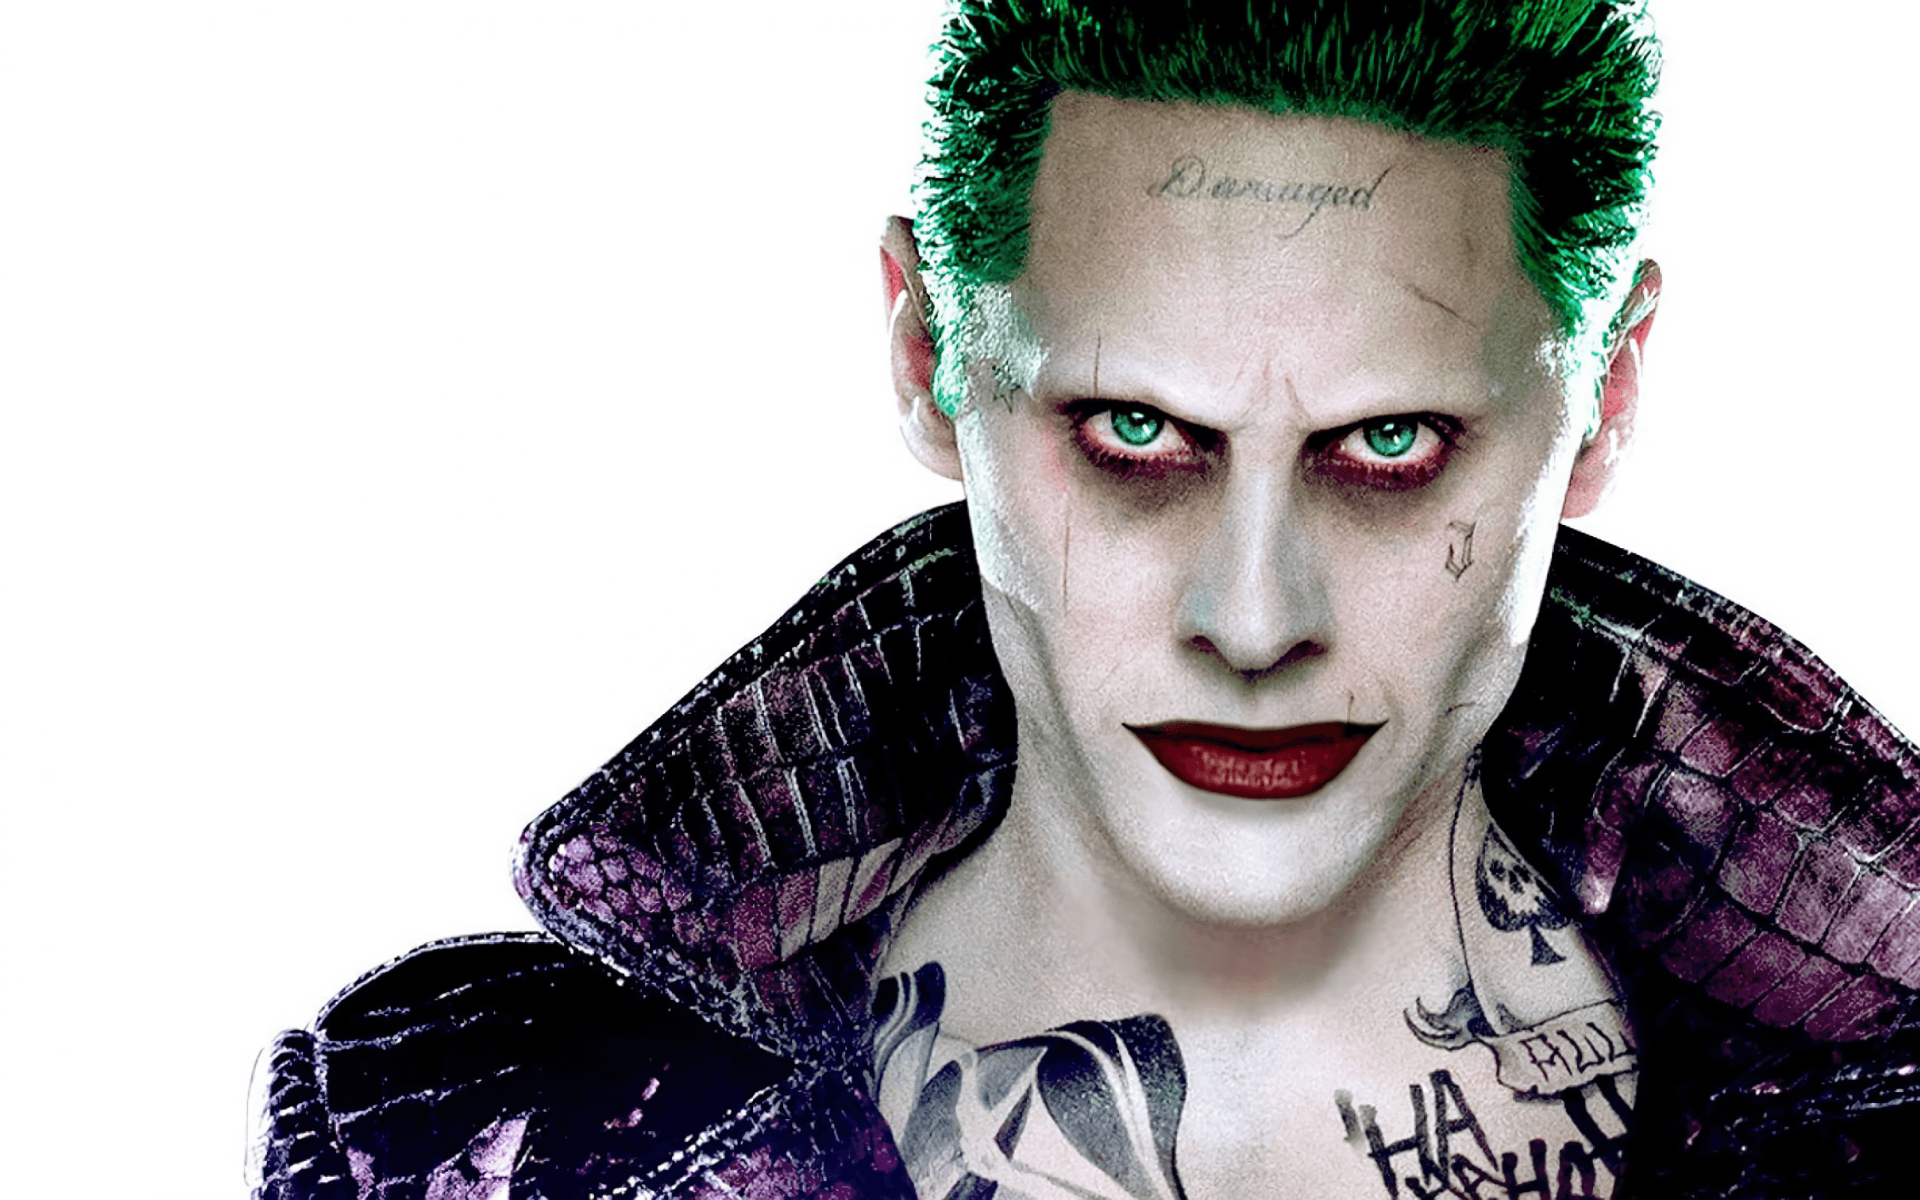 Jared Leto Joker Wallpapers Top Free Jared Leto Joker